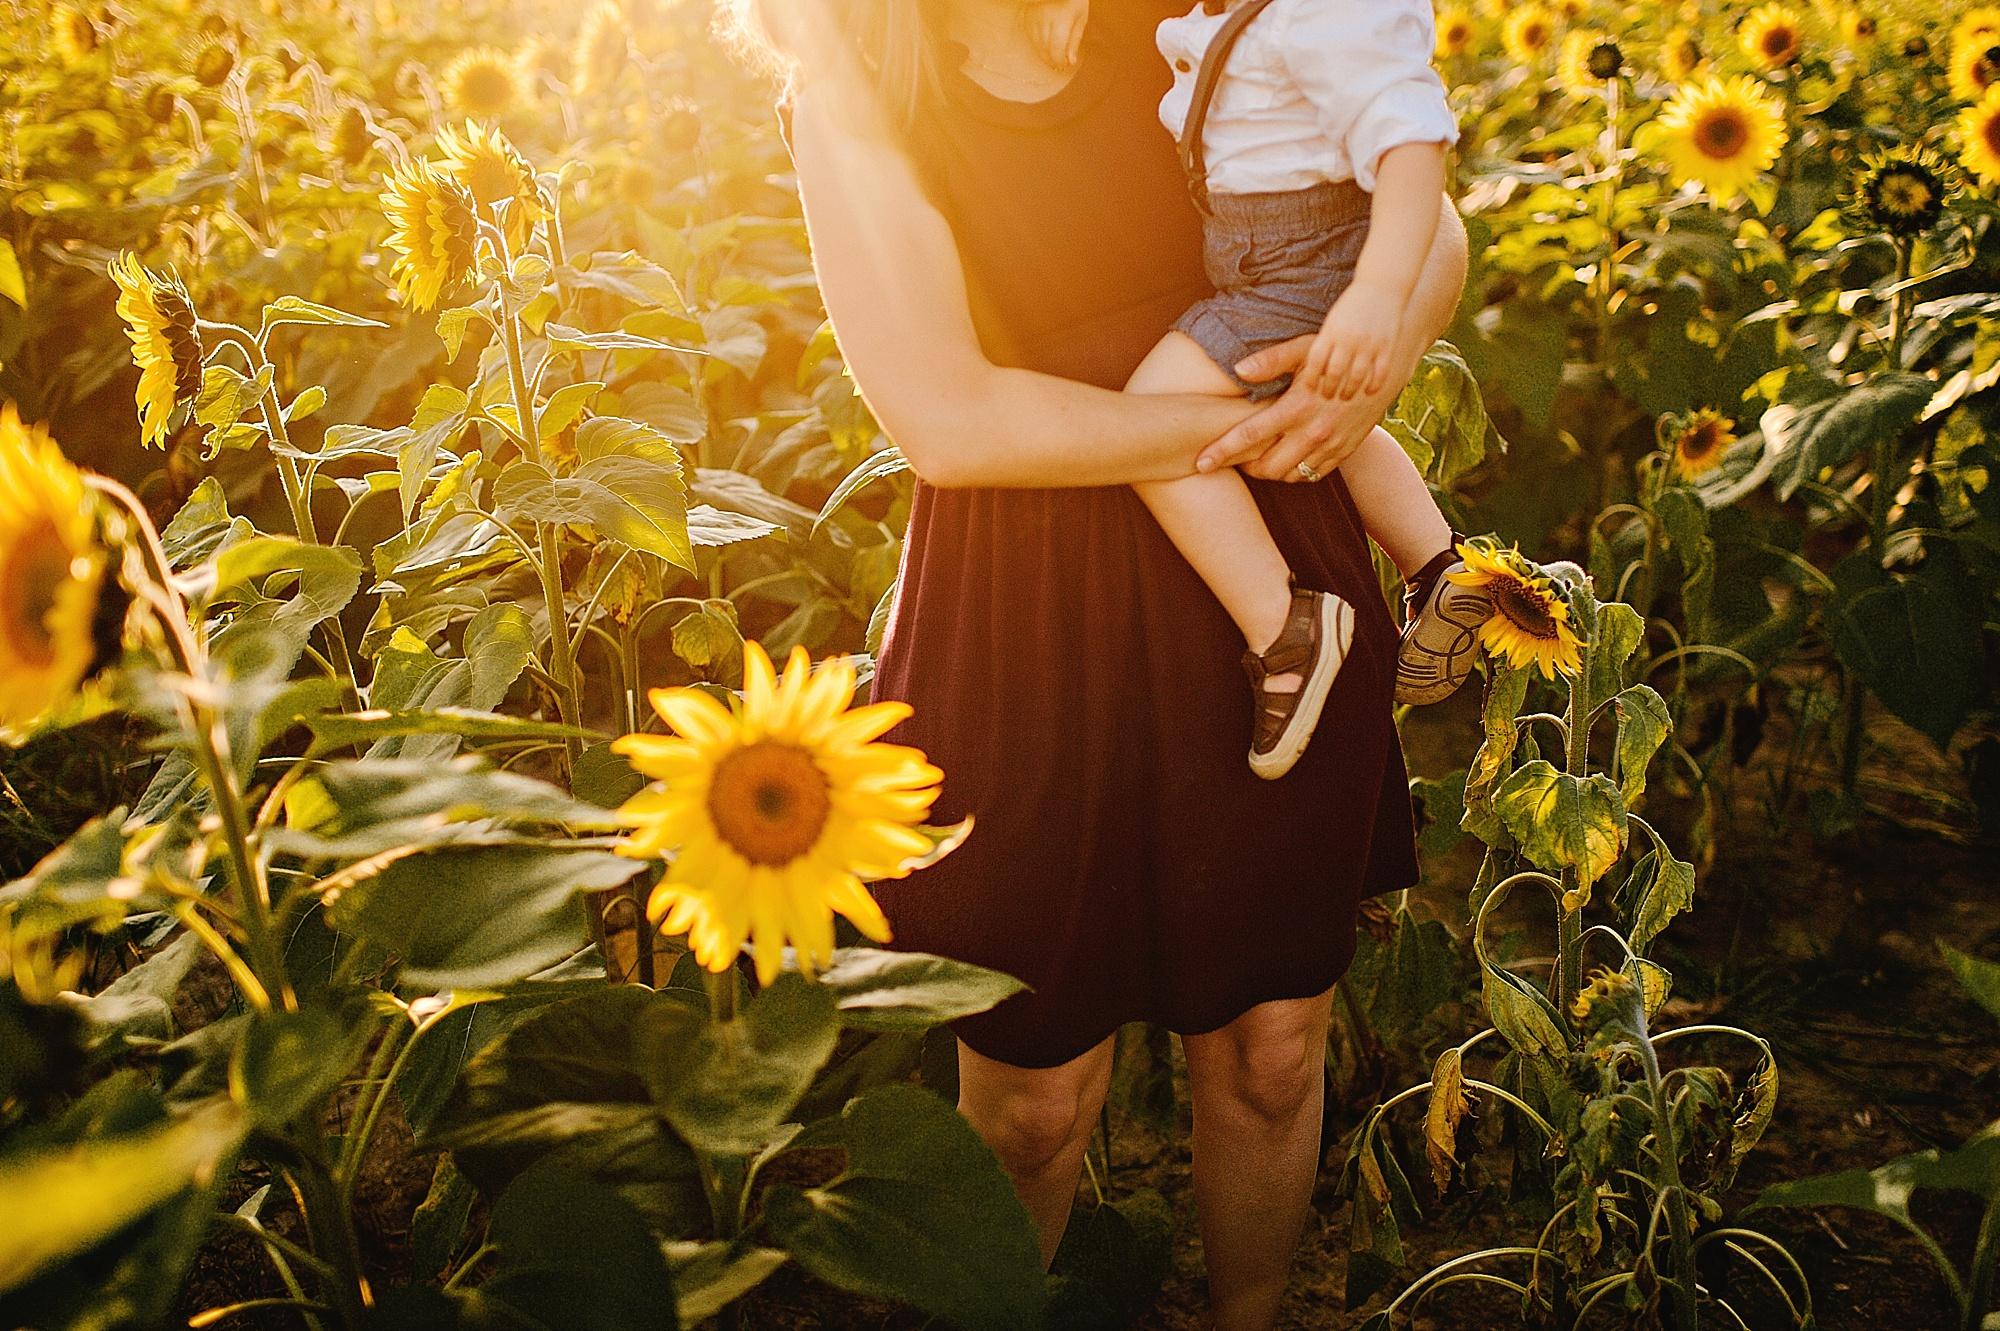 Schreiner-family-lauren-grayson-cleveland-photographer-sunflower-field-session_0020.jpg